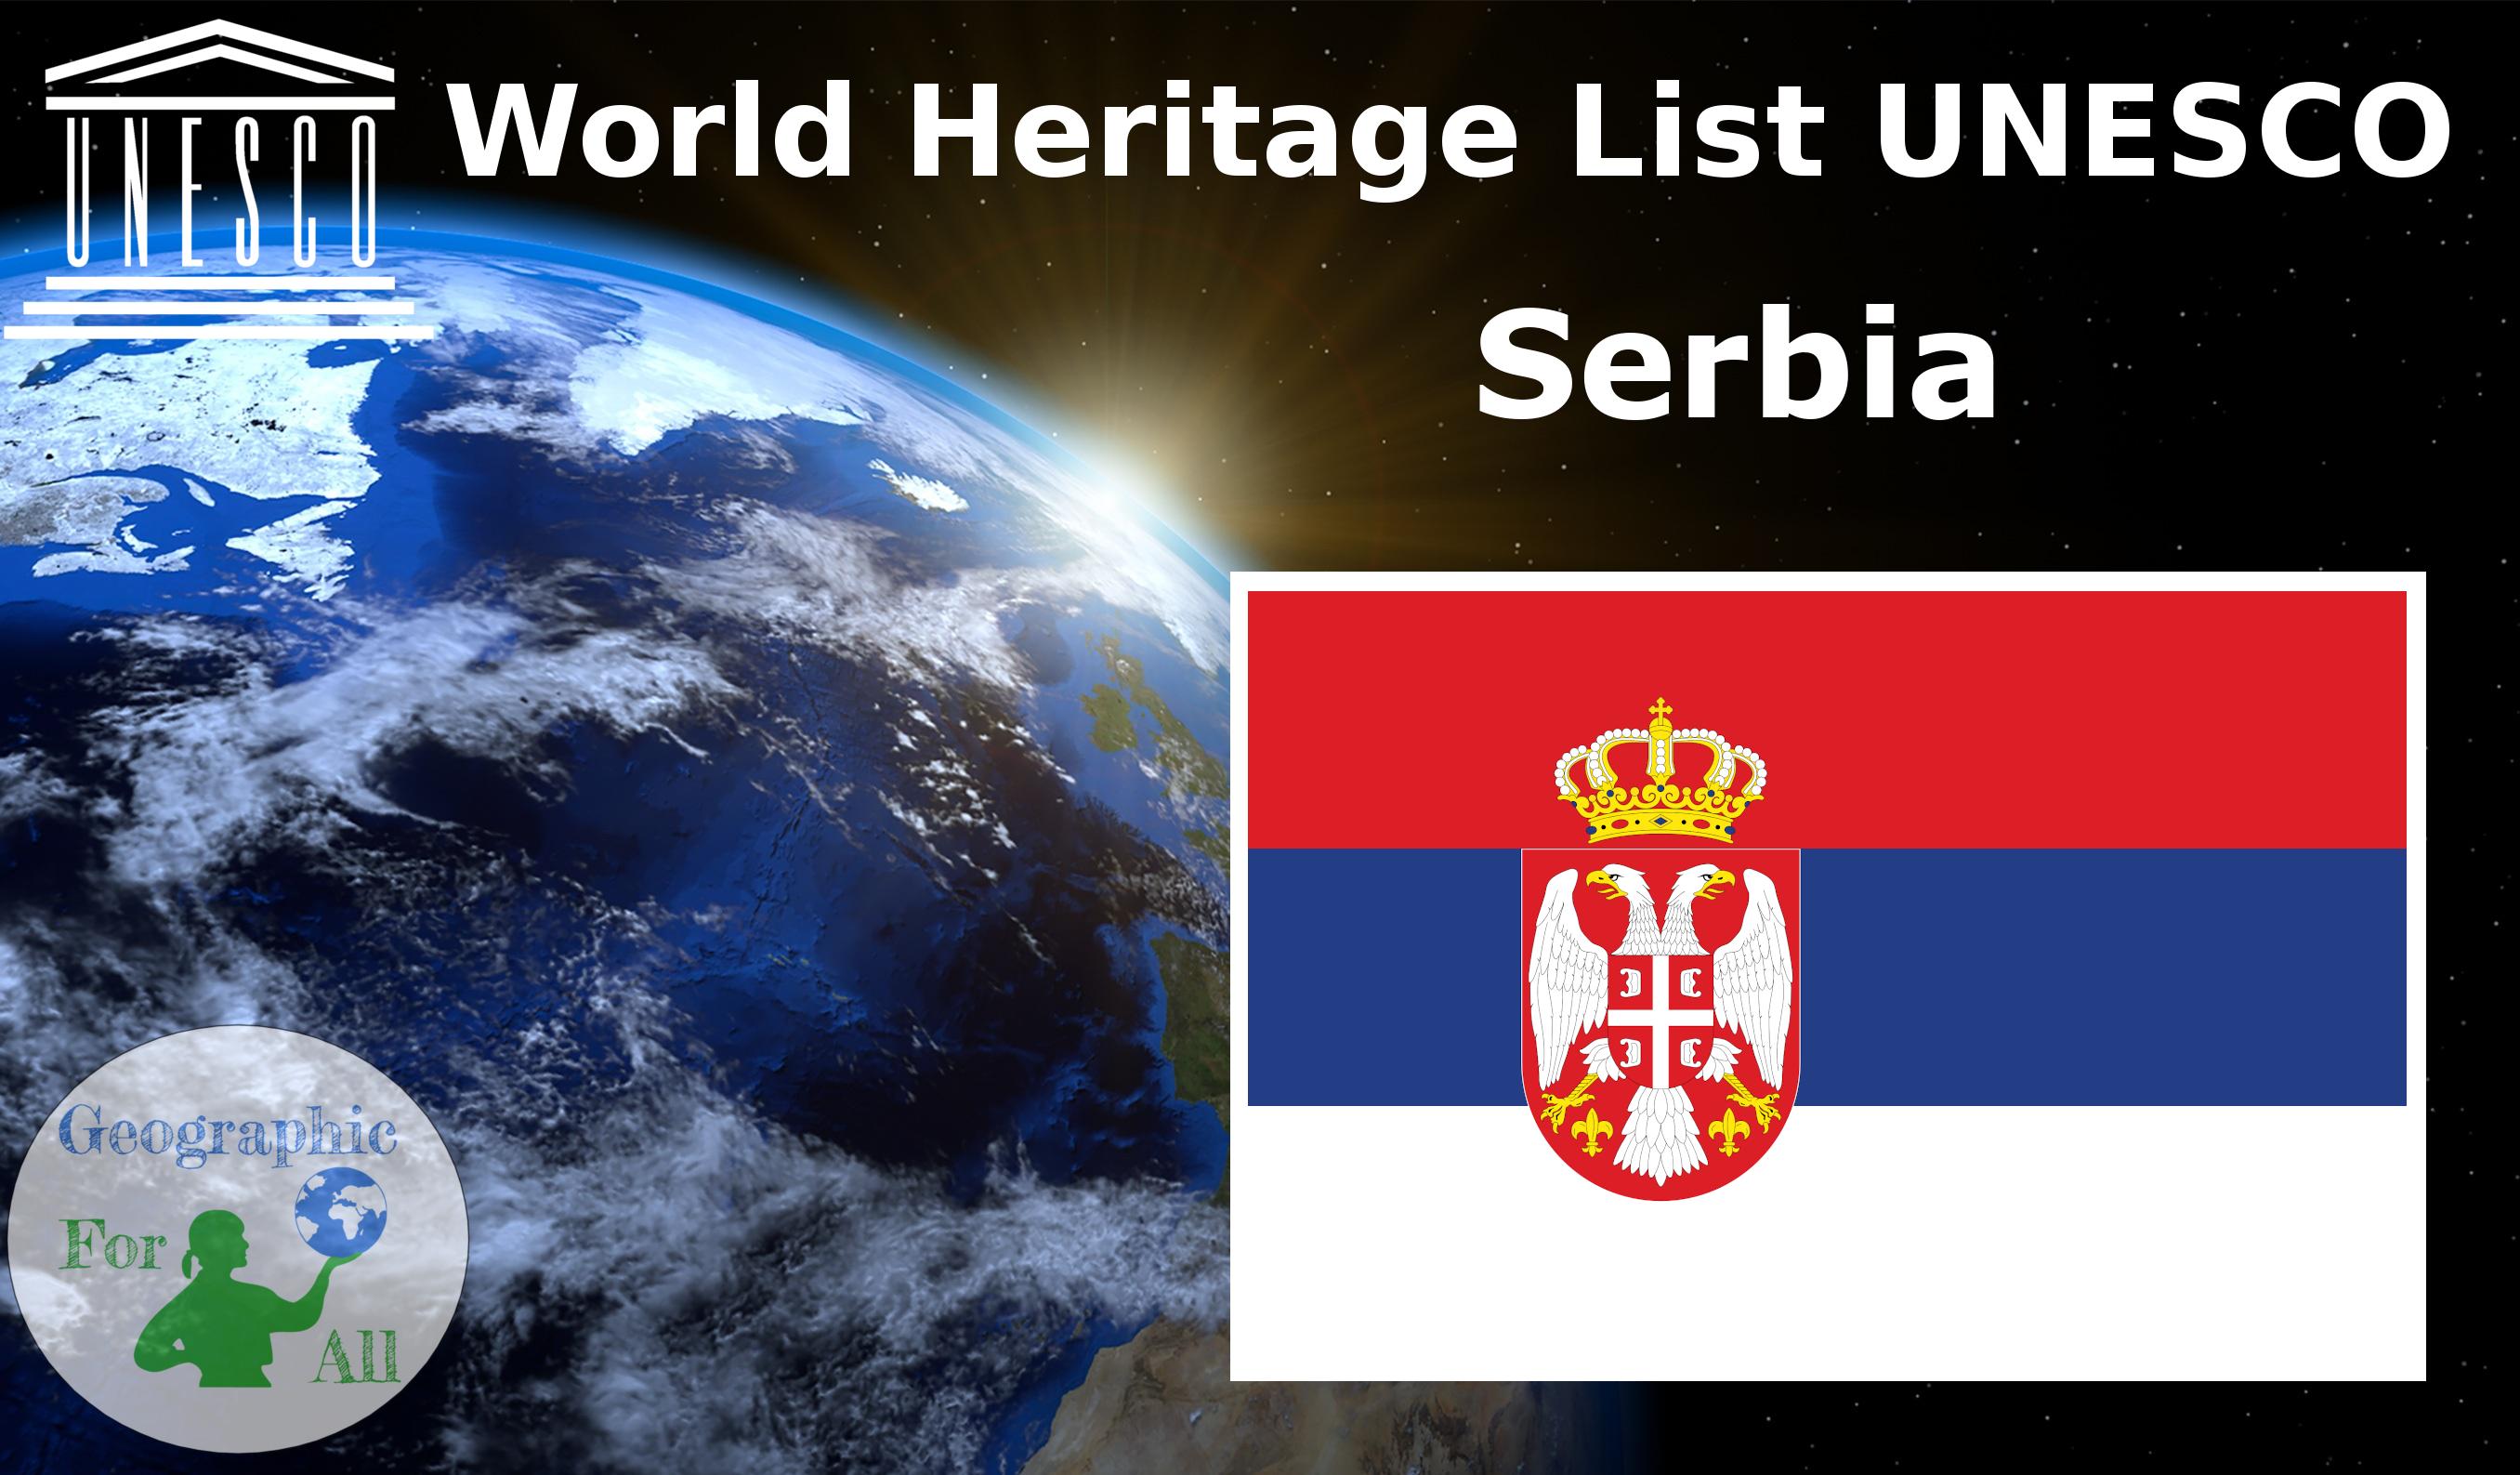 World Heritage List UNESCO - Serbia